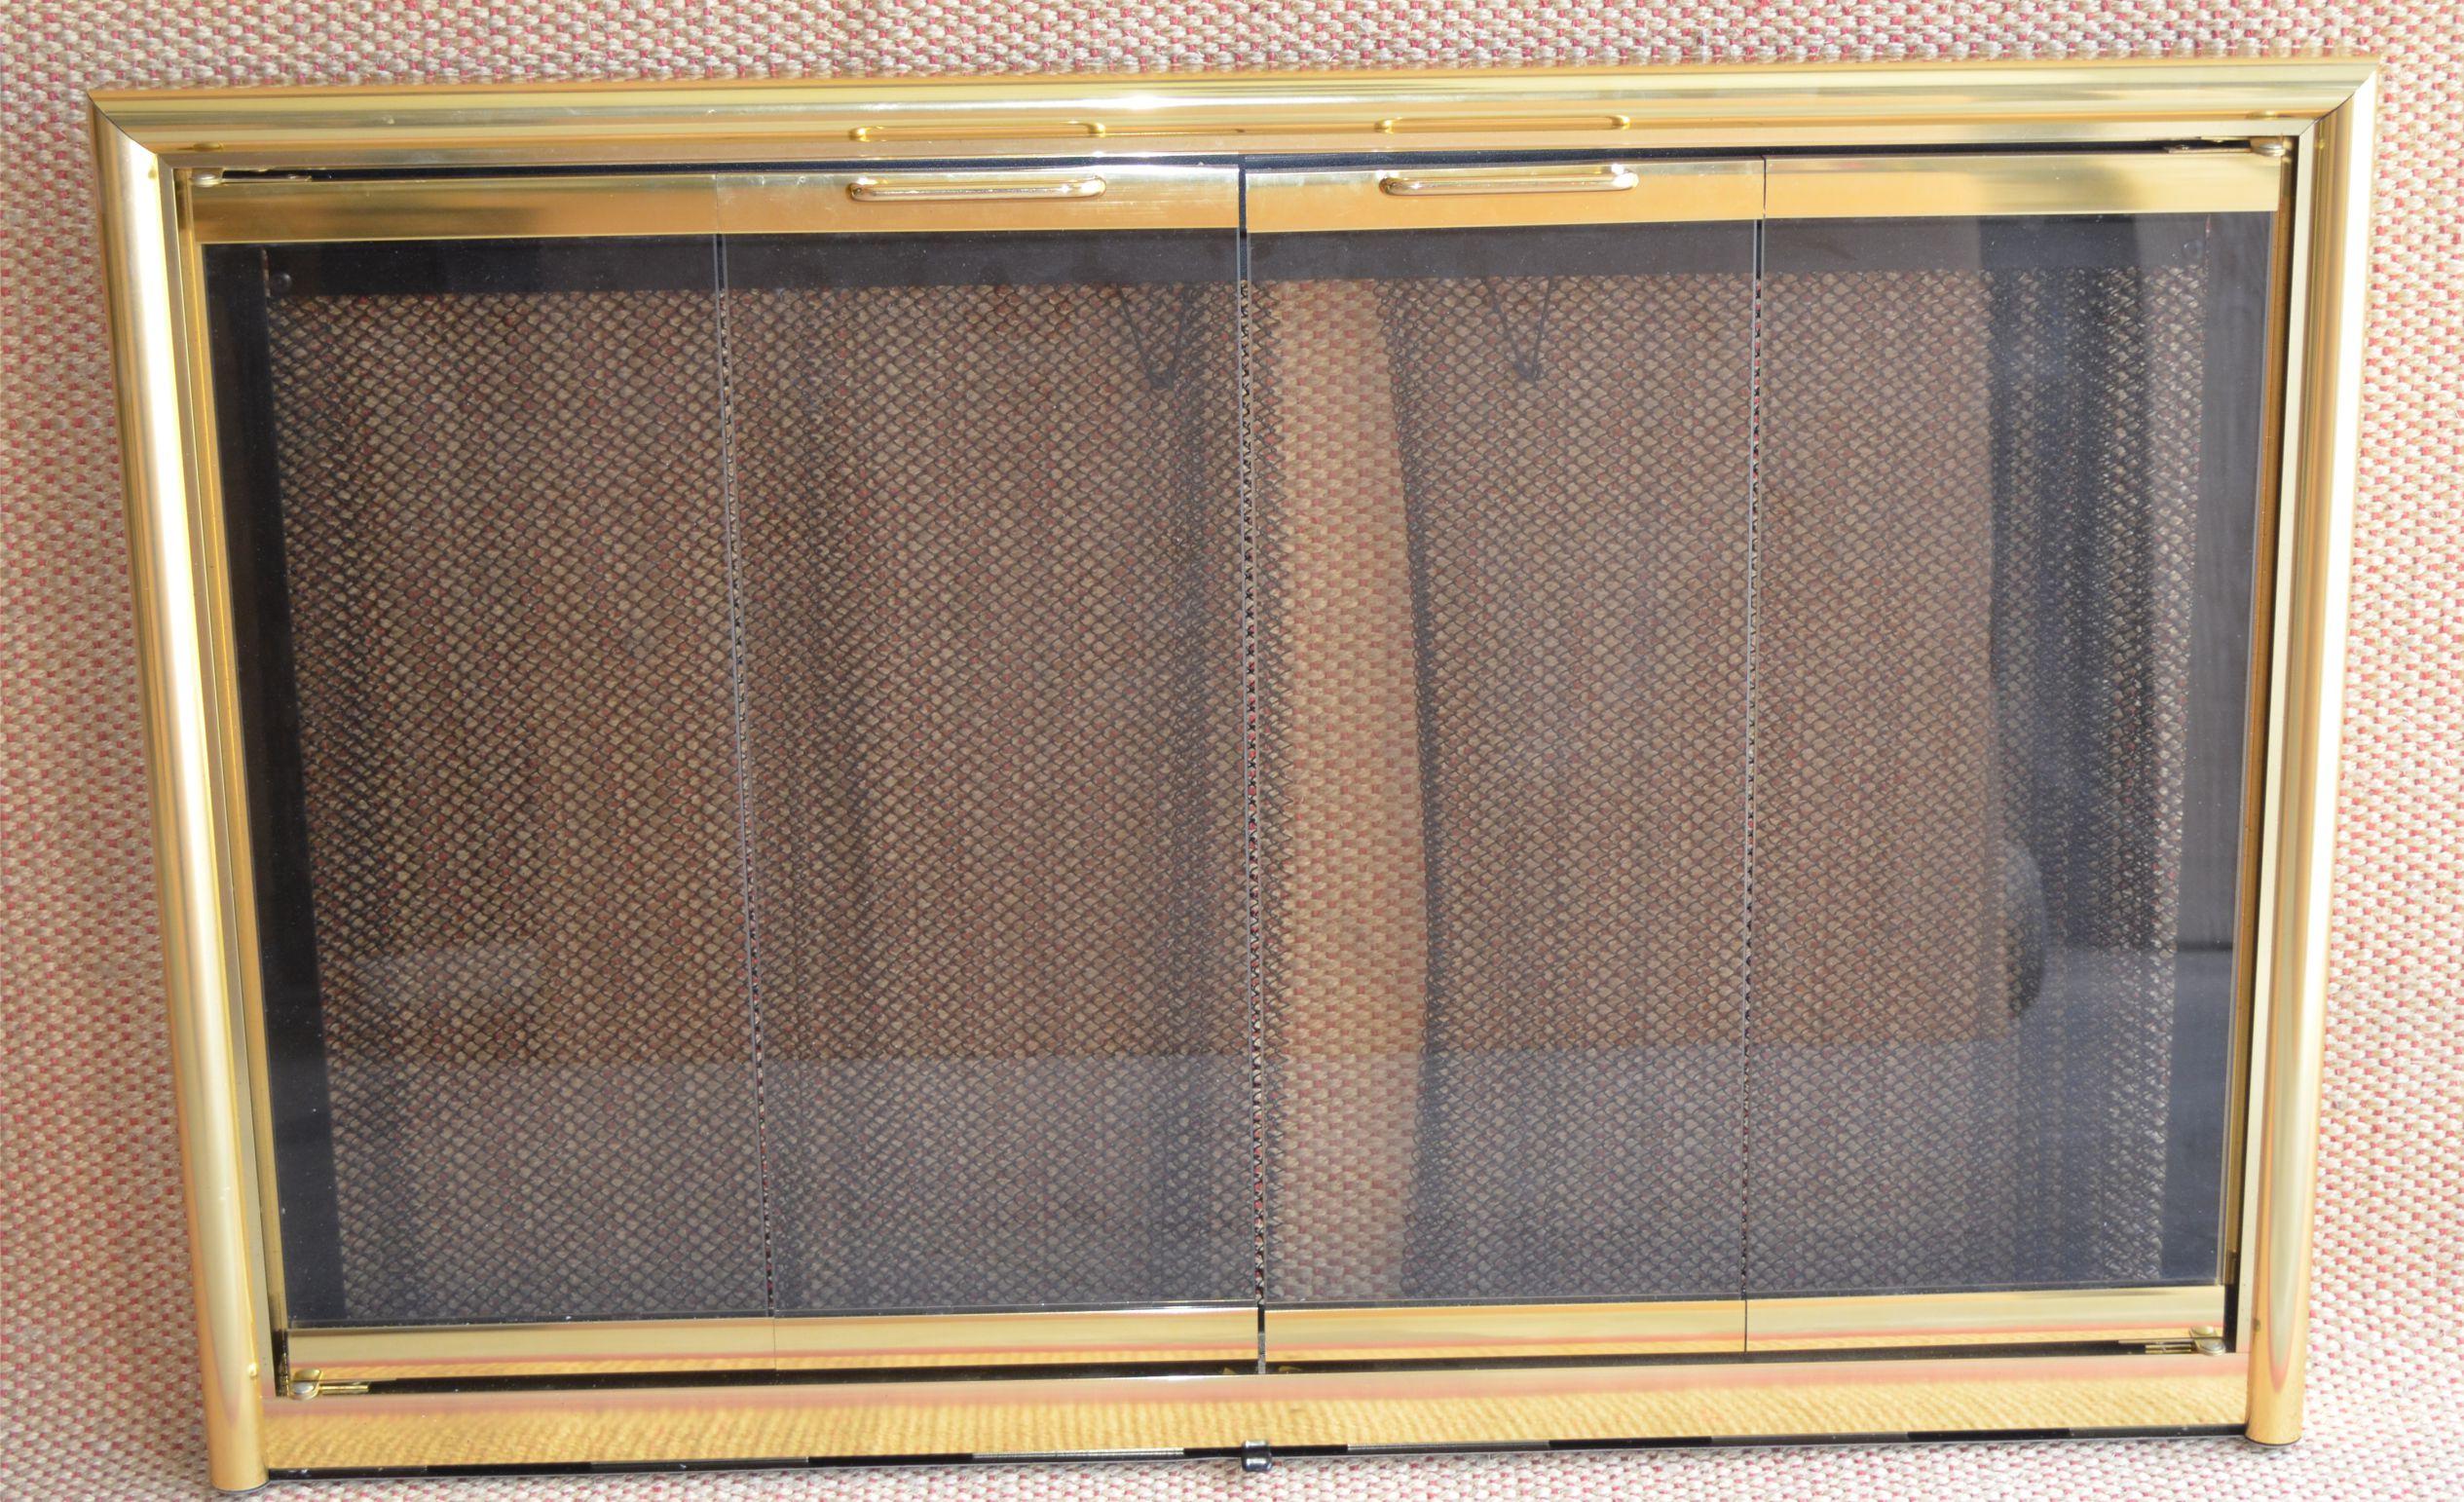 Polished Brass Mystique Fireplace Door 38x25 Inch